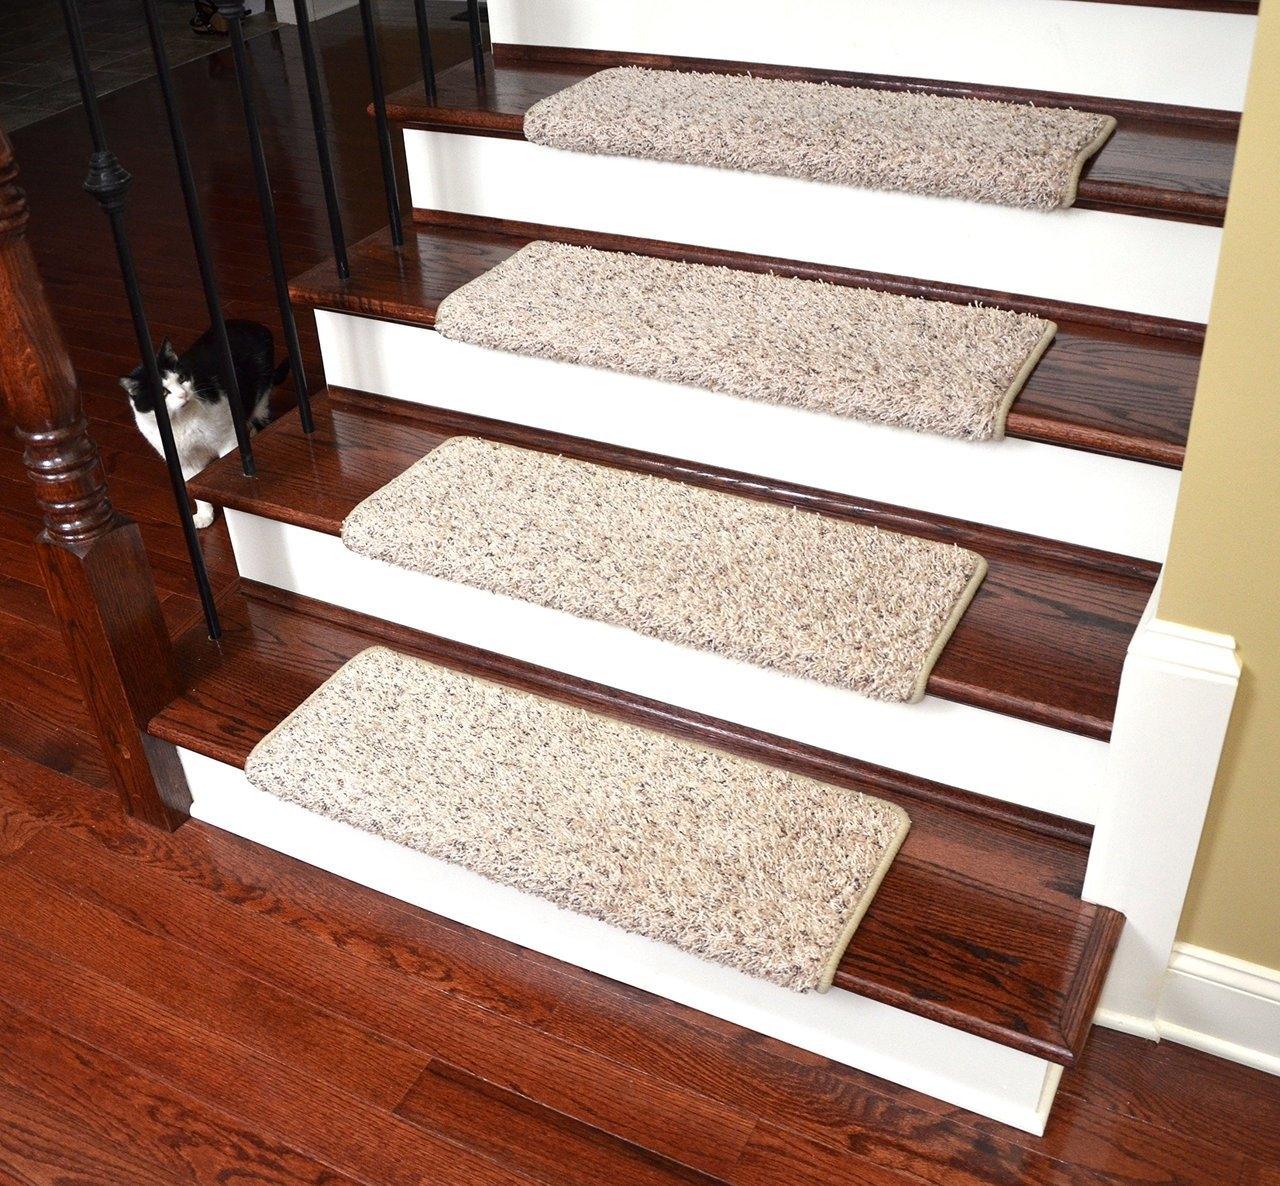 Terrific Stair Tread Rugs Canada 110 Stair Tread Rugs Canada With Stair Tread Carpet Adhesive (Image 14 of 15)